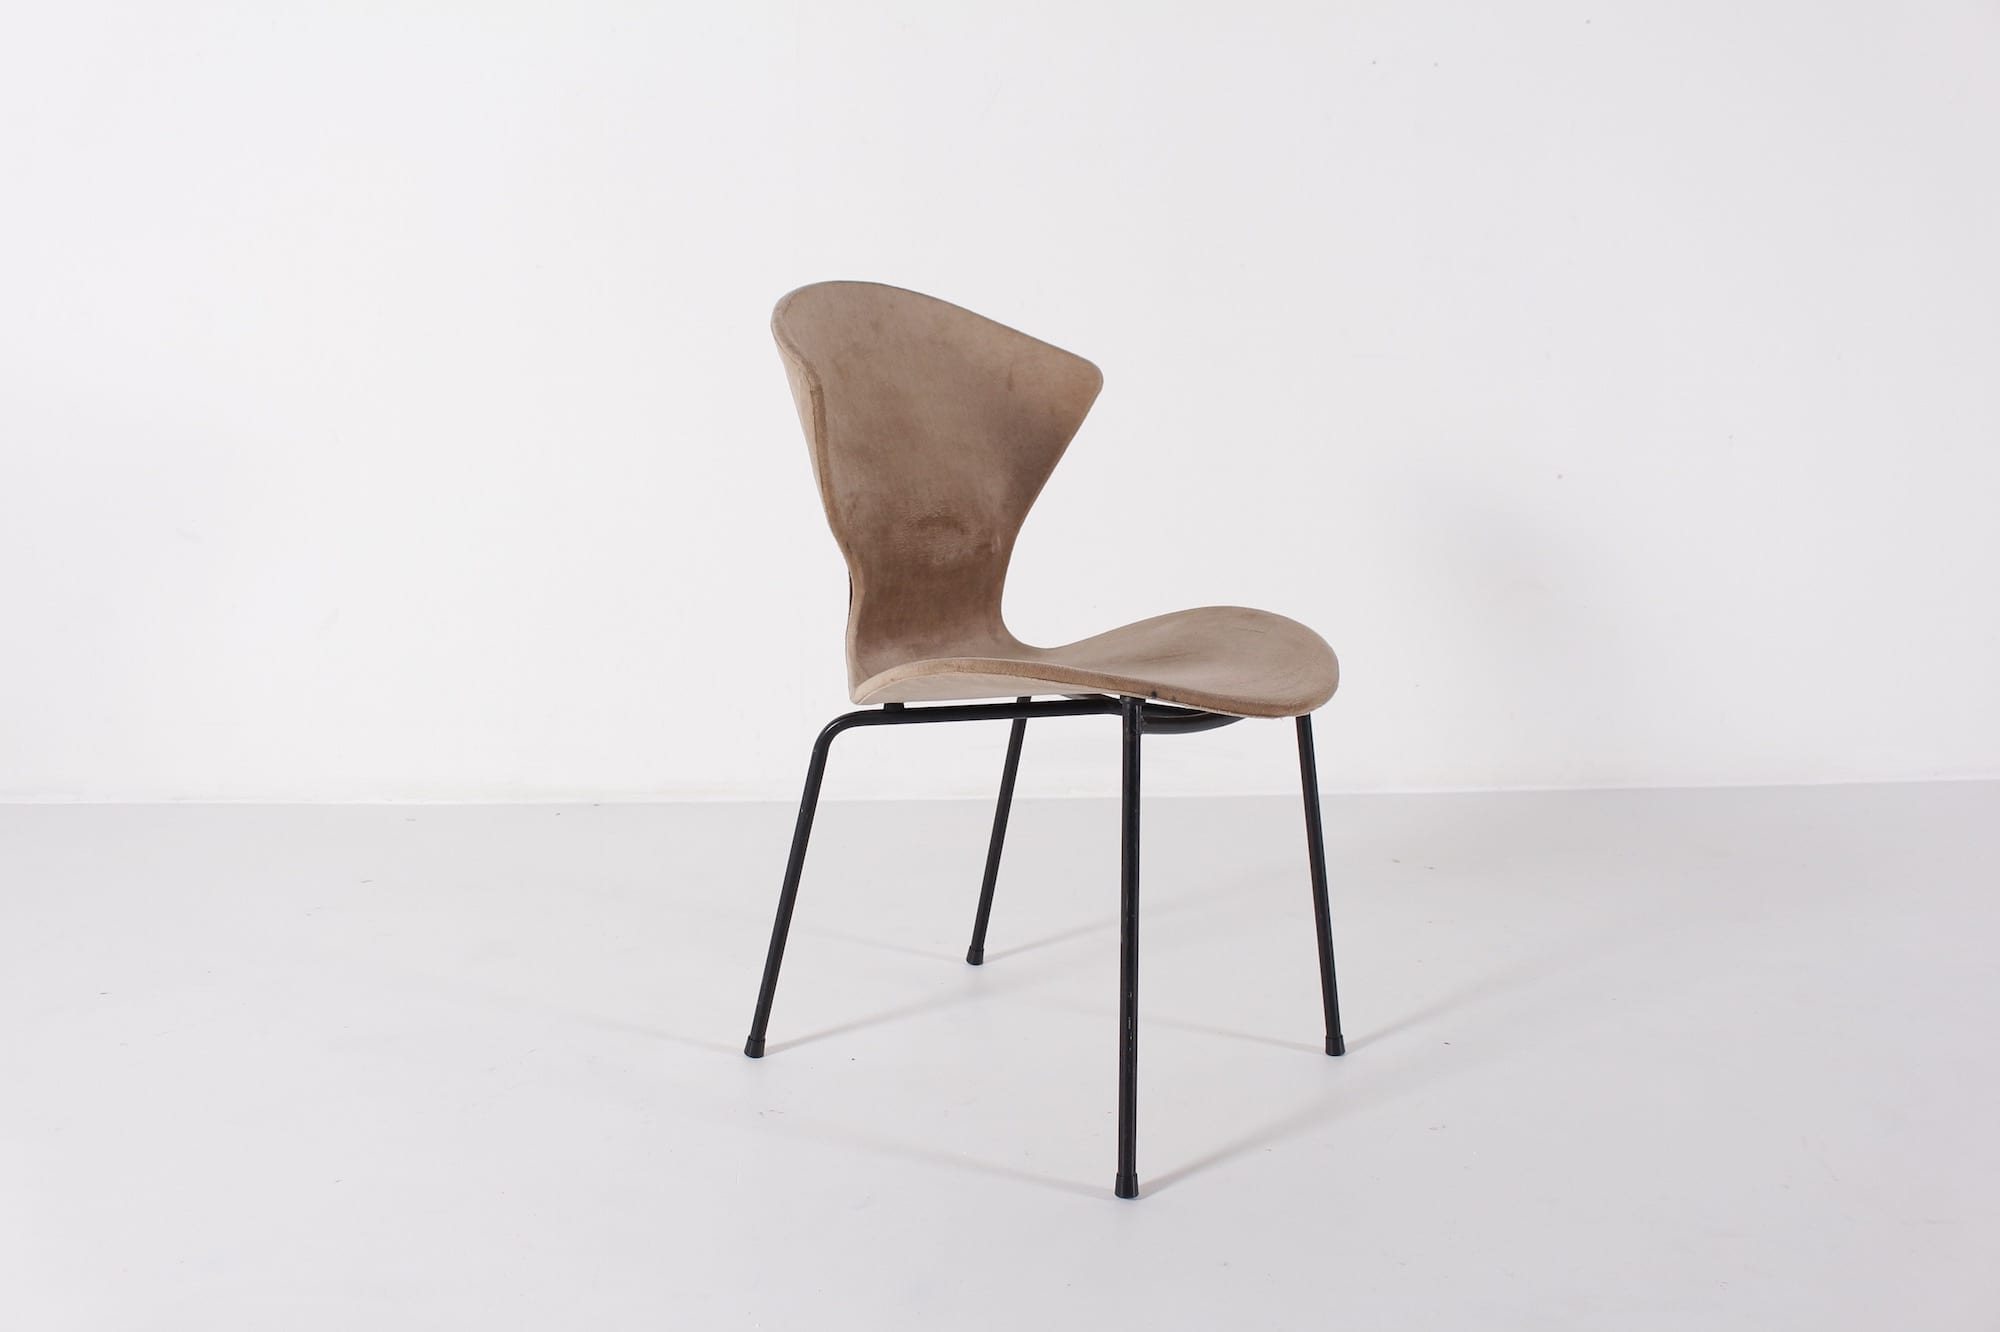 genevi ve dangles pour burov 6 chaises meubles vintage li ge. Black Bedroom Furniture Sets. Home Design Ideas